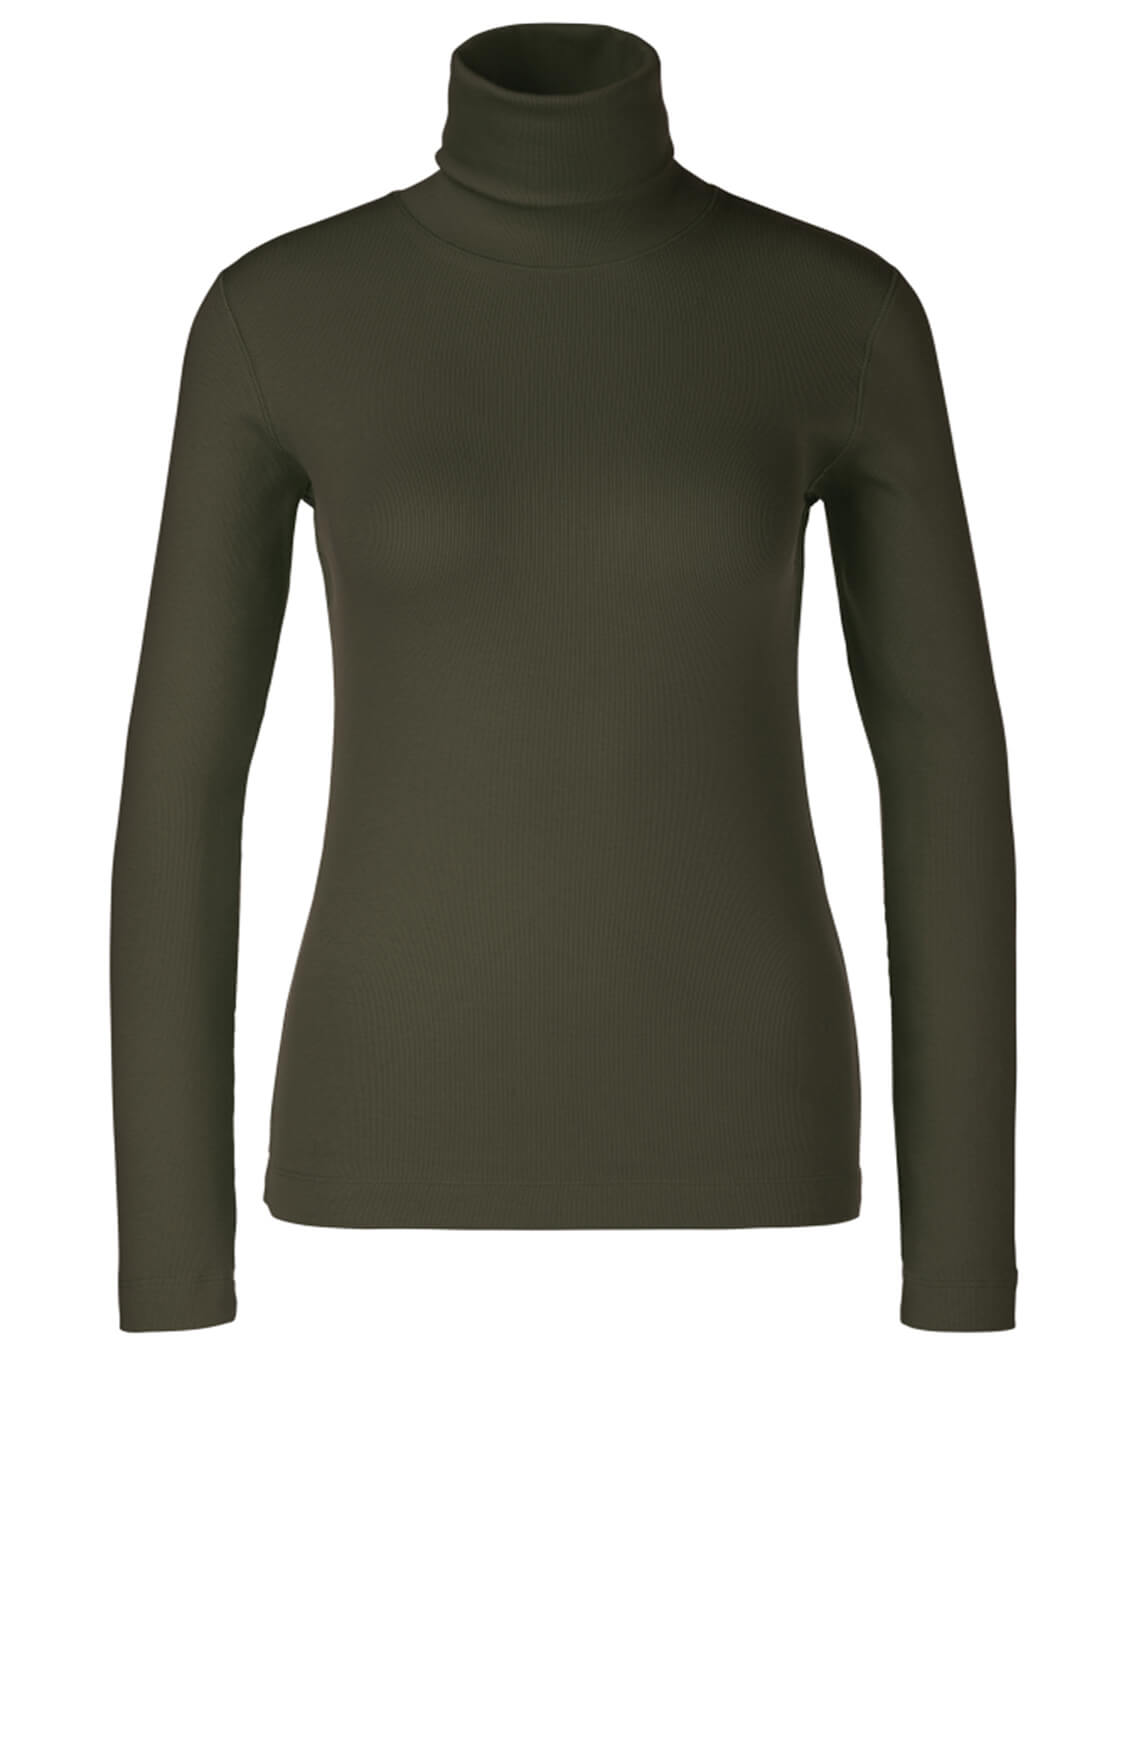 Marccain Sports Dames Shirt met rolkraag groen